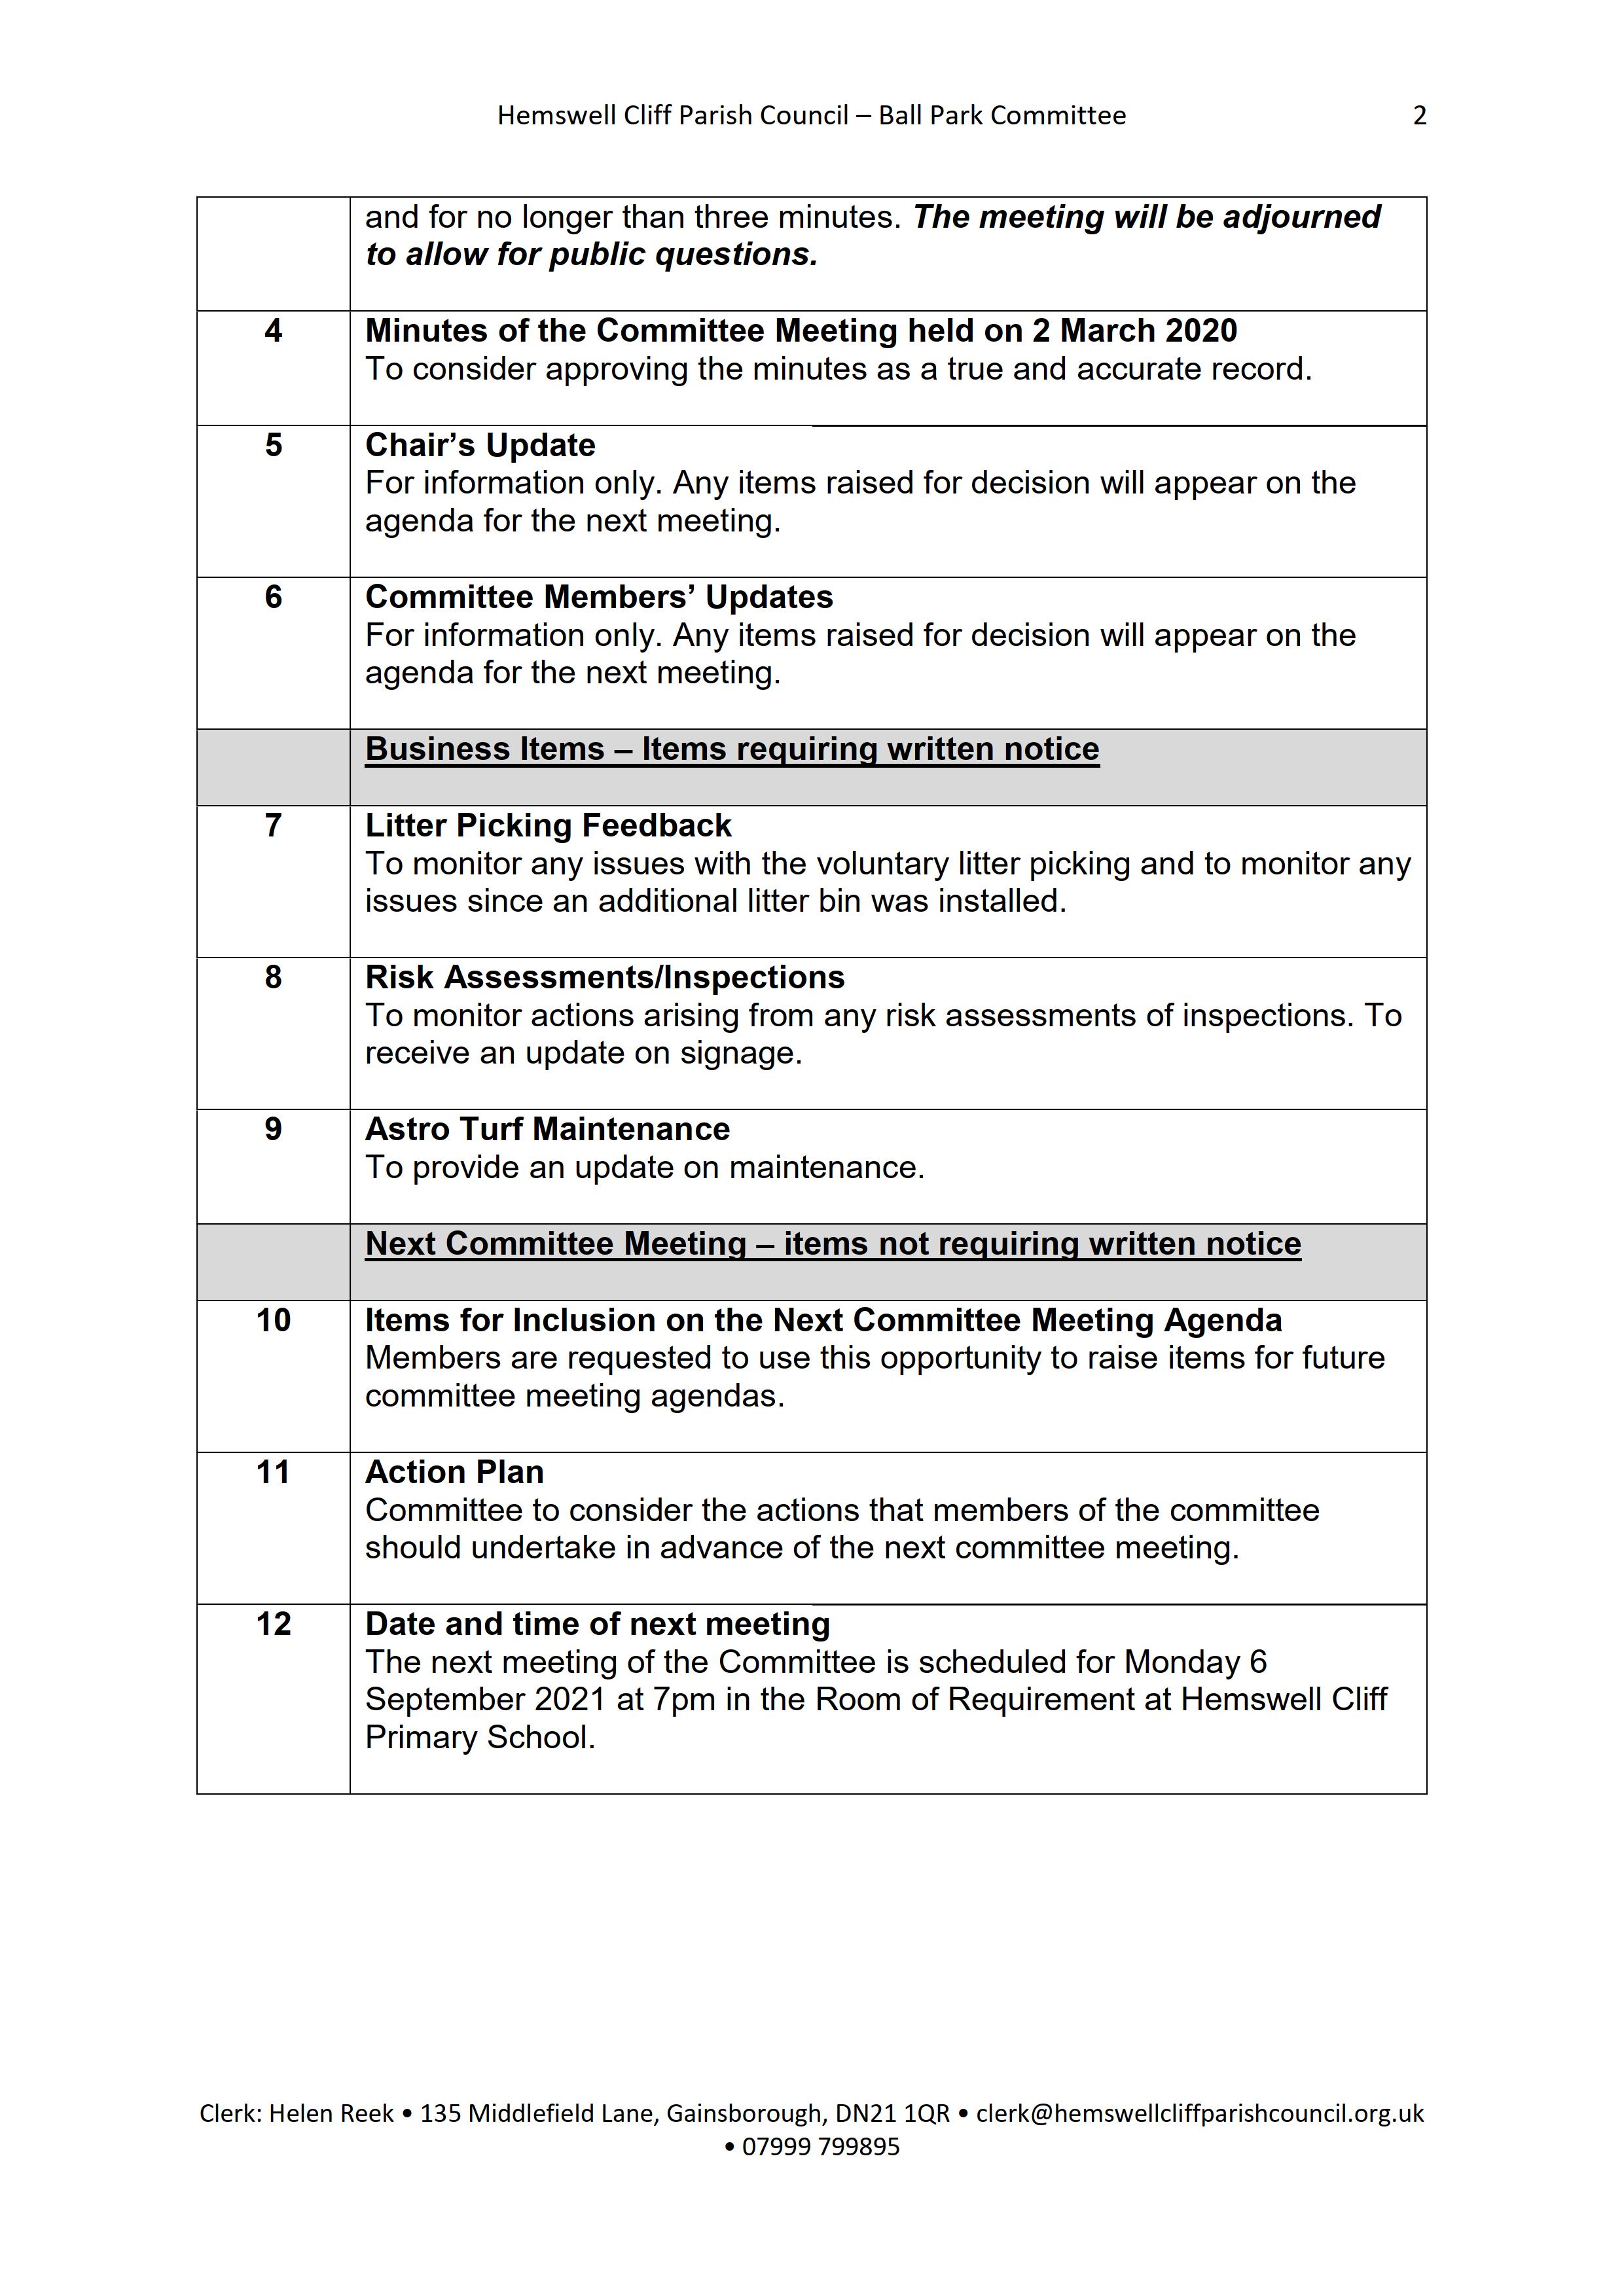 HCPC_BallPark_Agenda_27.04.21_2.png